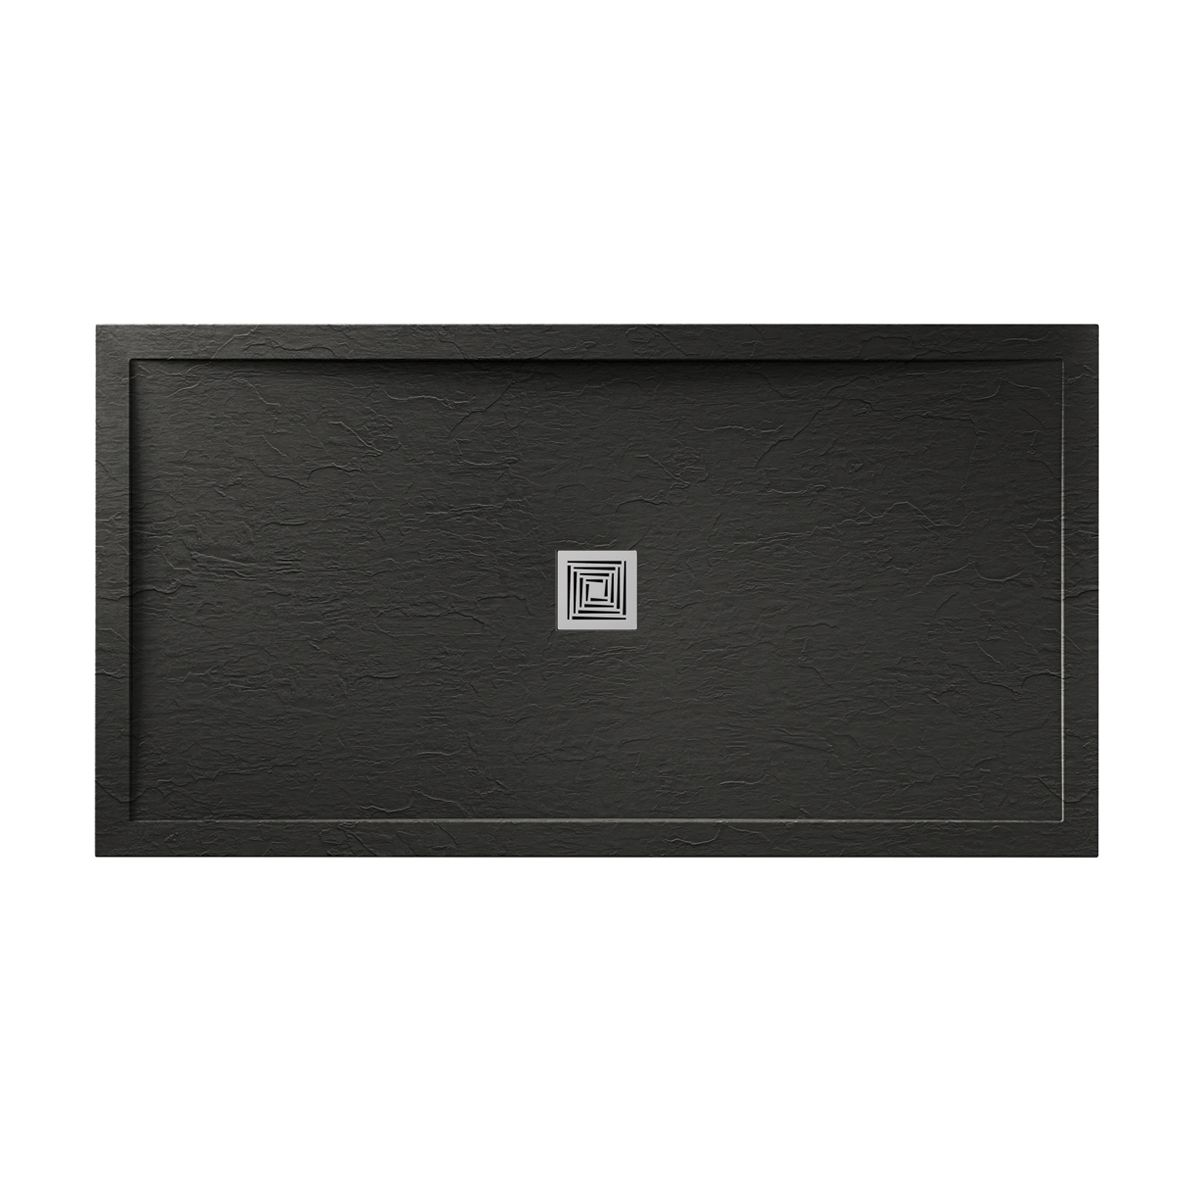 Aquadart Black Slate Shower Tray 1000 x 800